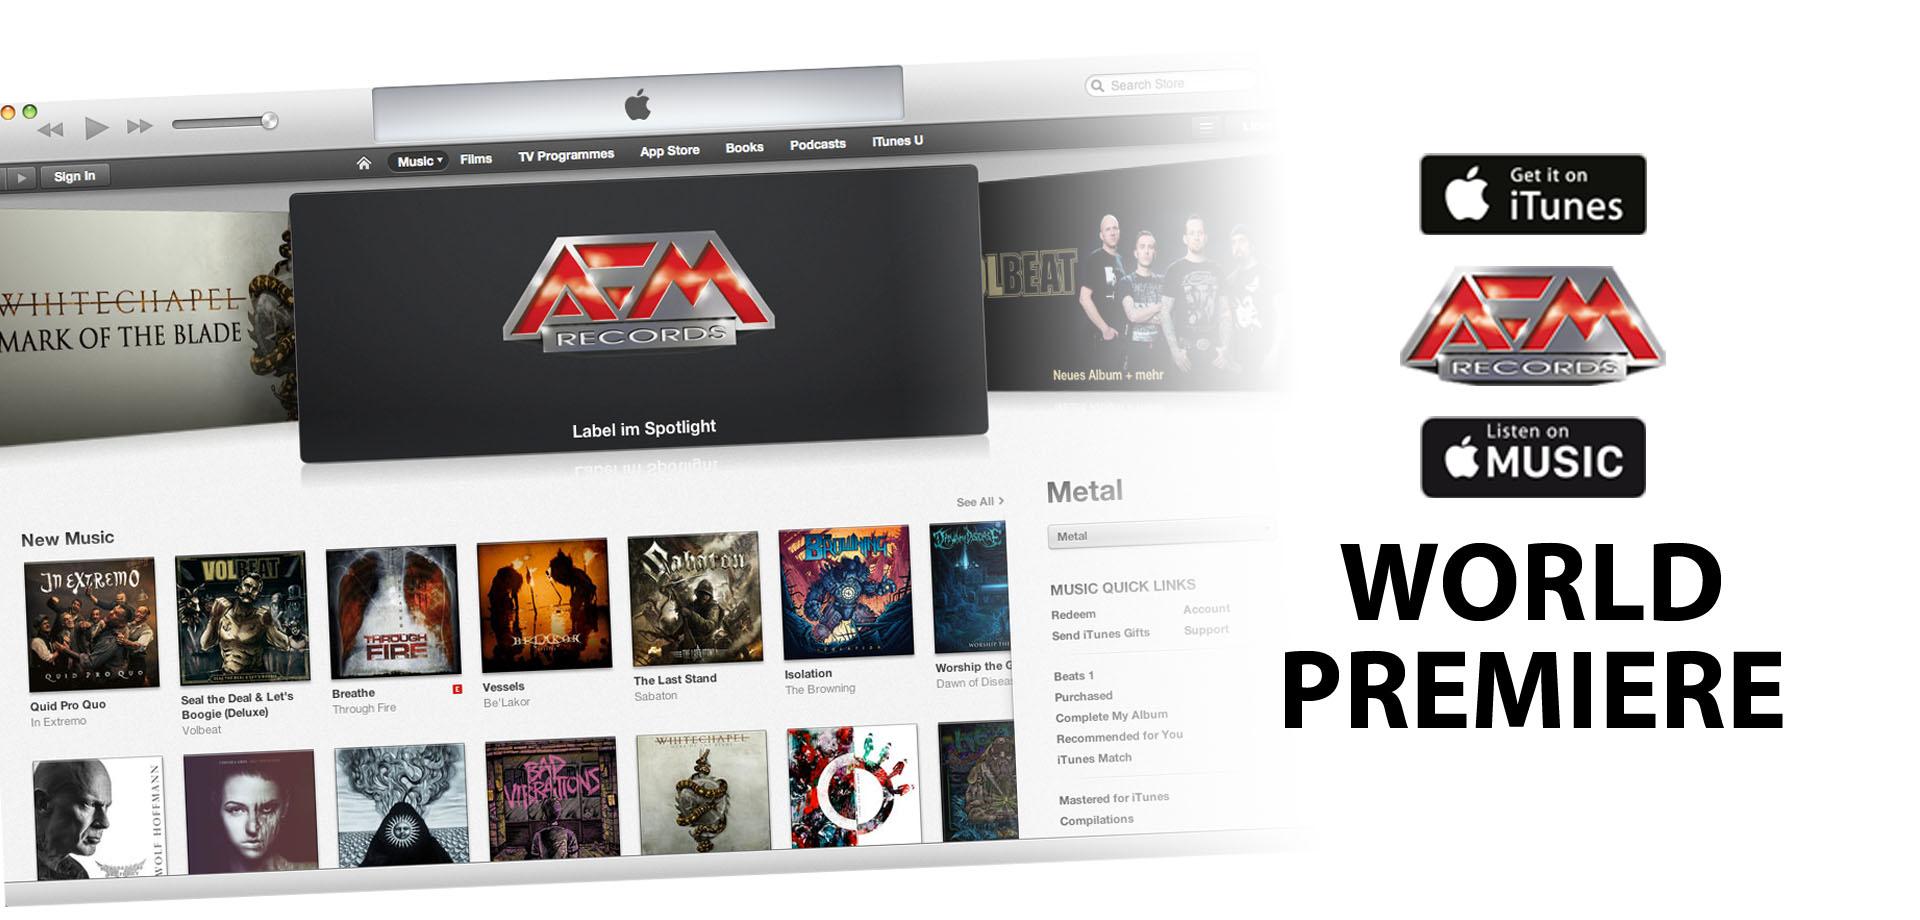 WORLD PREMIERE: AFM RECORDS & APPLE